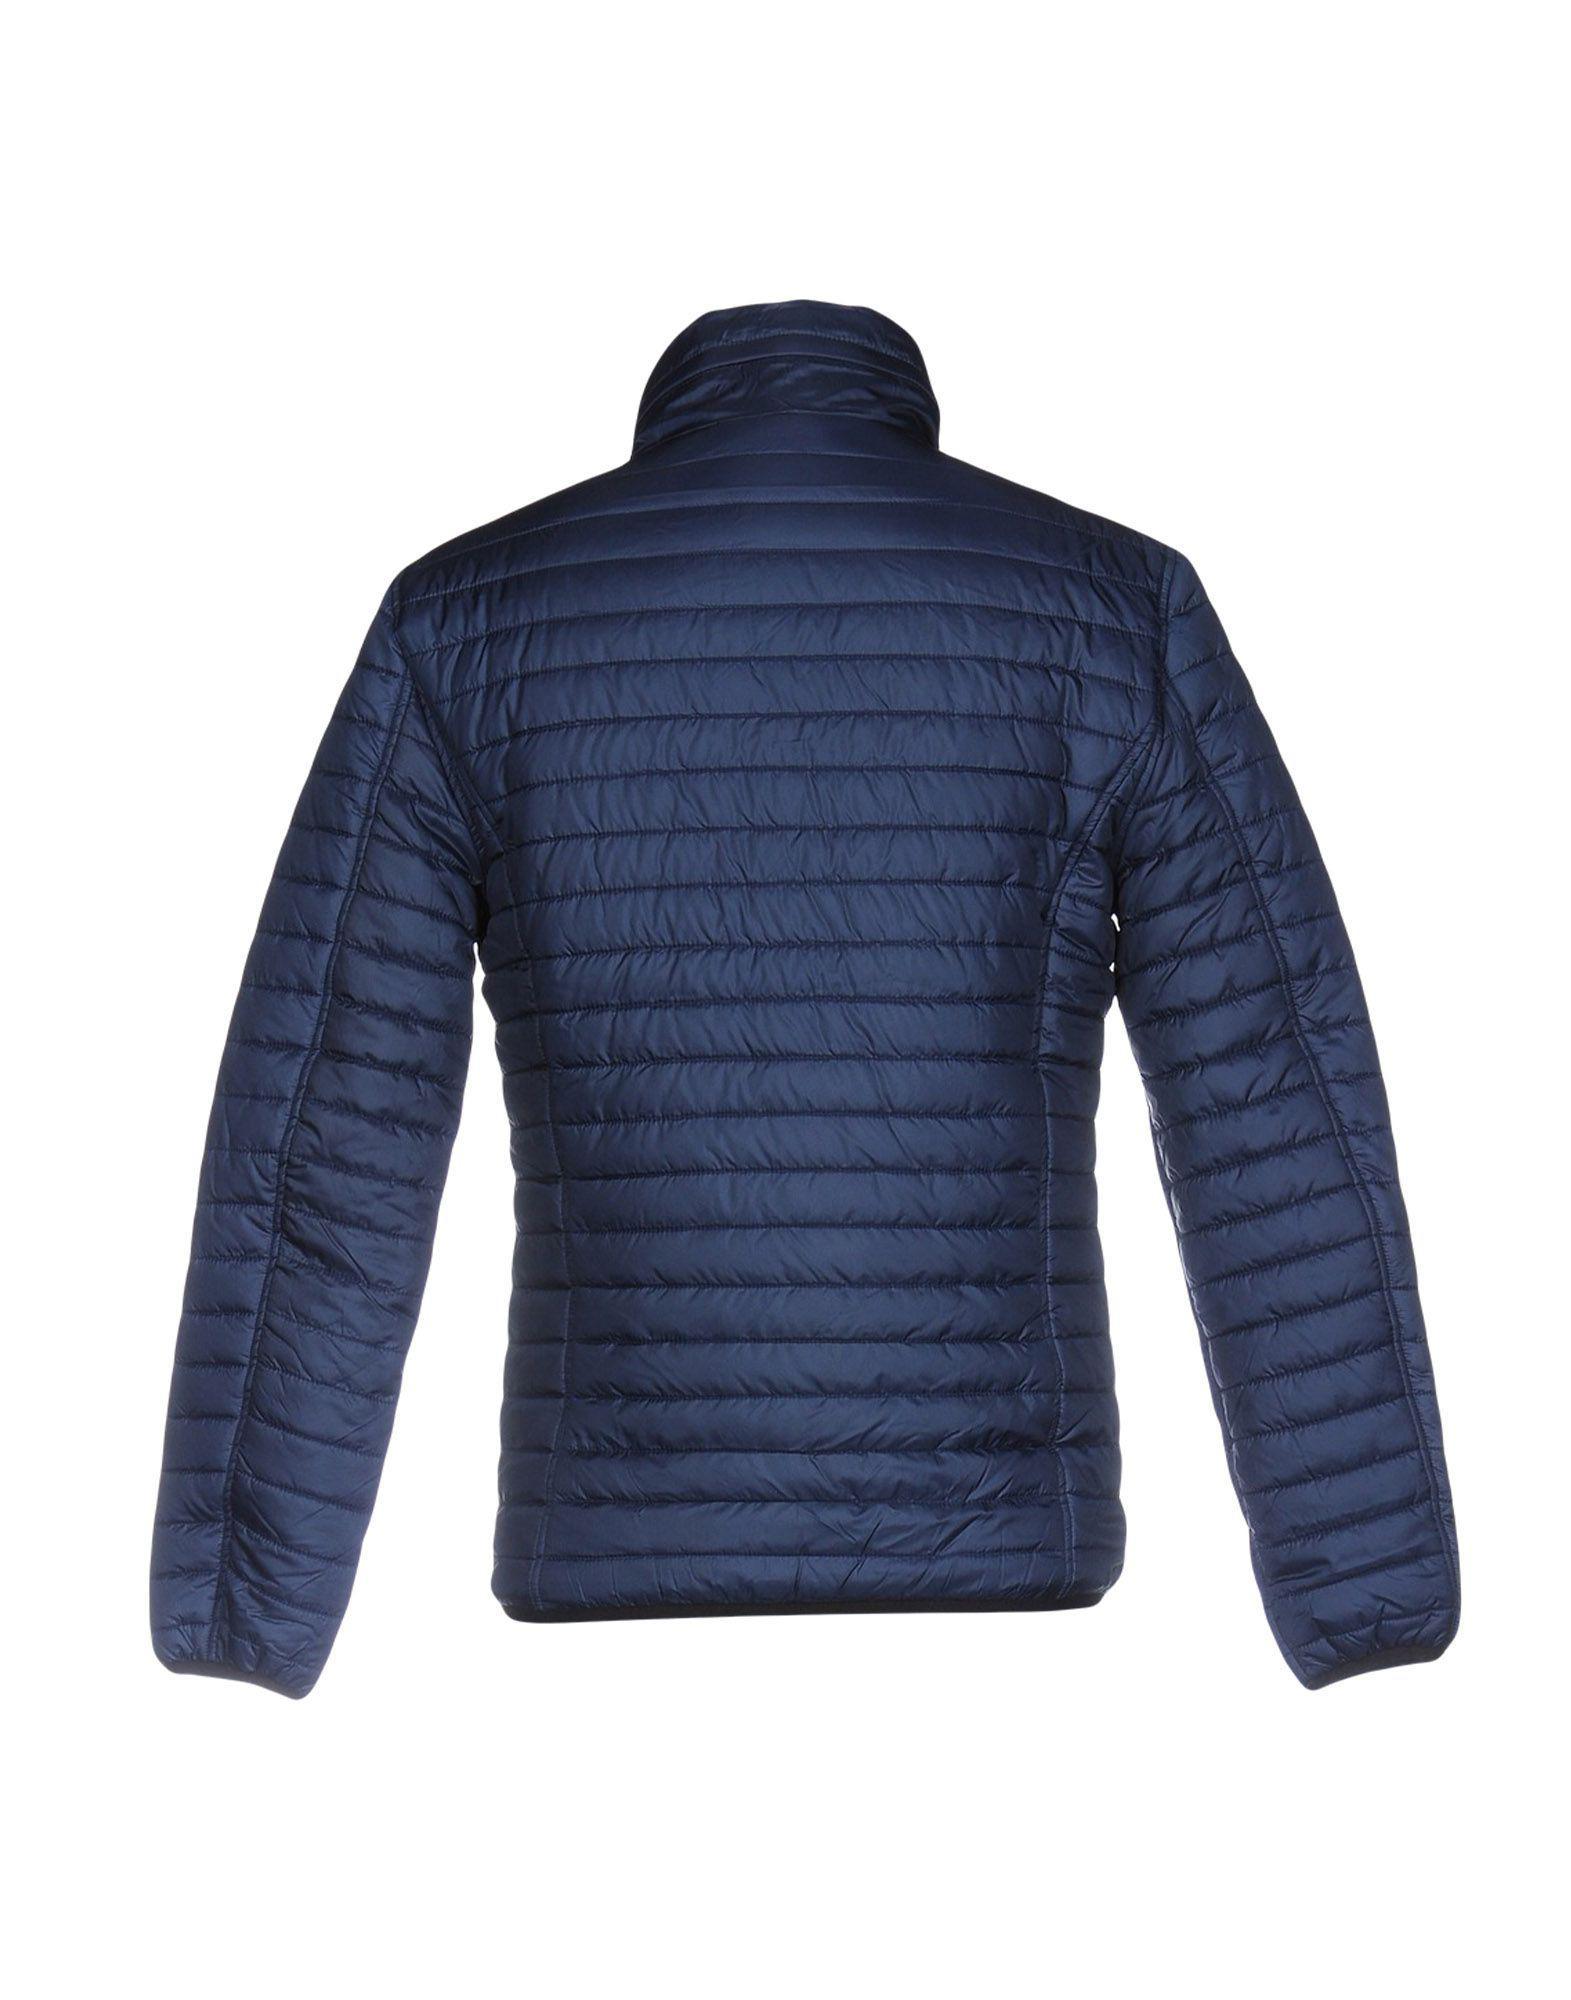 Grey Daniele Alessandrini Synthetic Jacket in Dark Blue (Blue) for Men